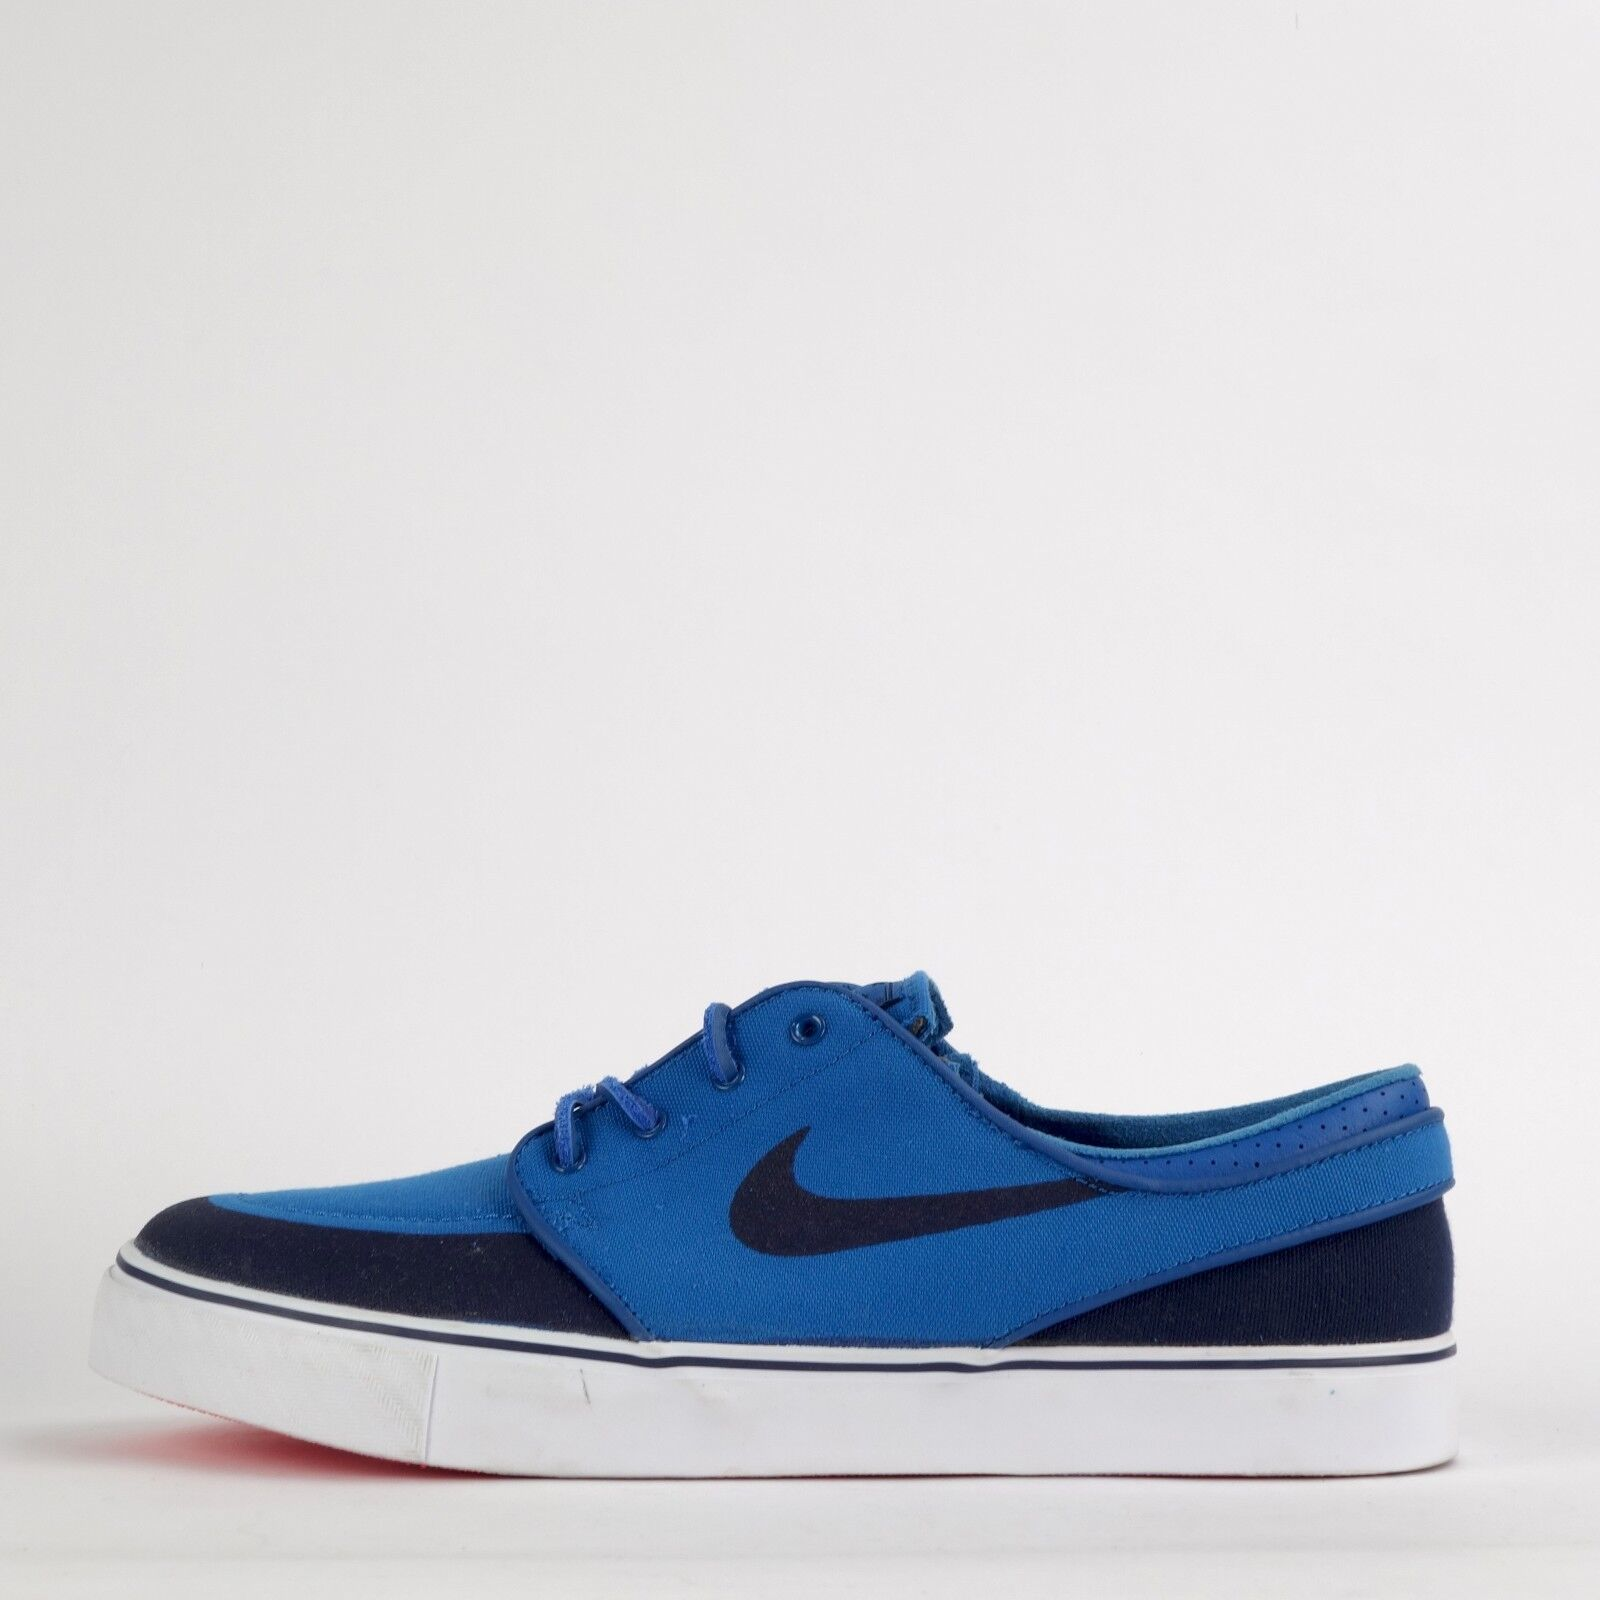 Nike SB Zoom Stefan Janoski Premium se Linea Uomo Scarpe da ginnastica Skateboard Blu